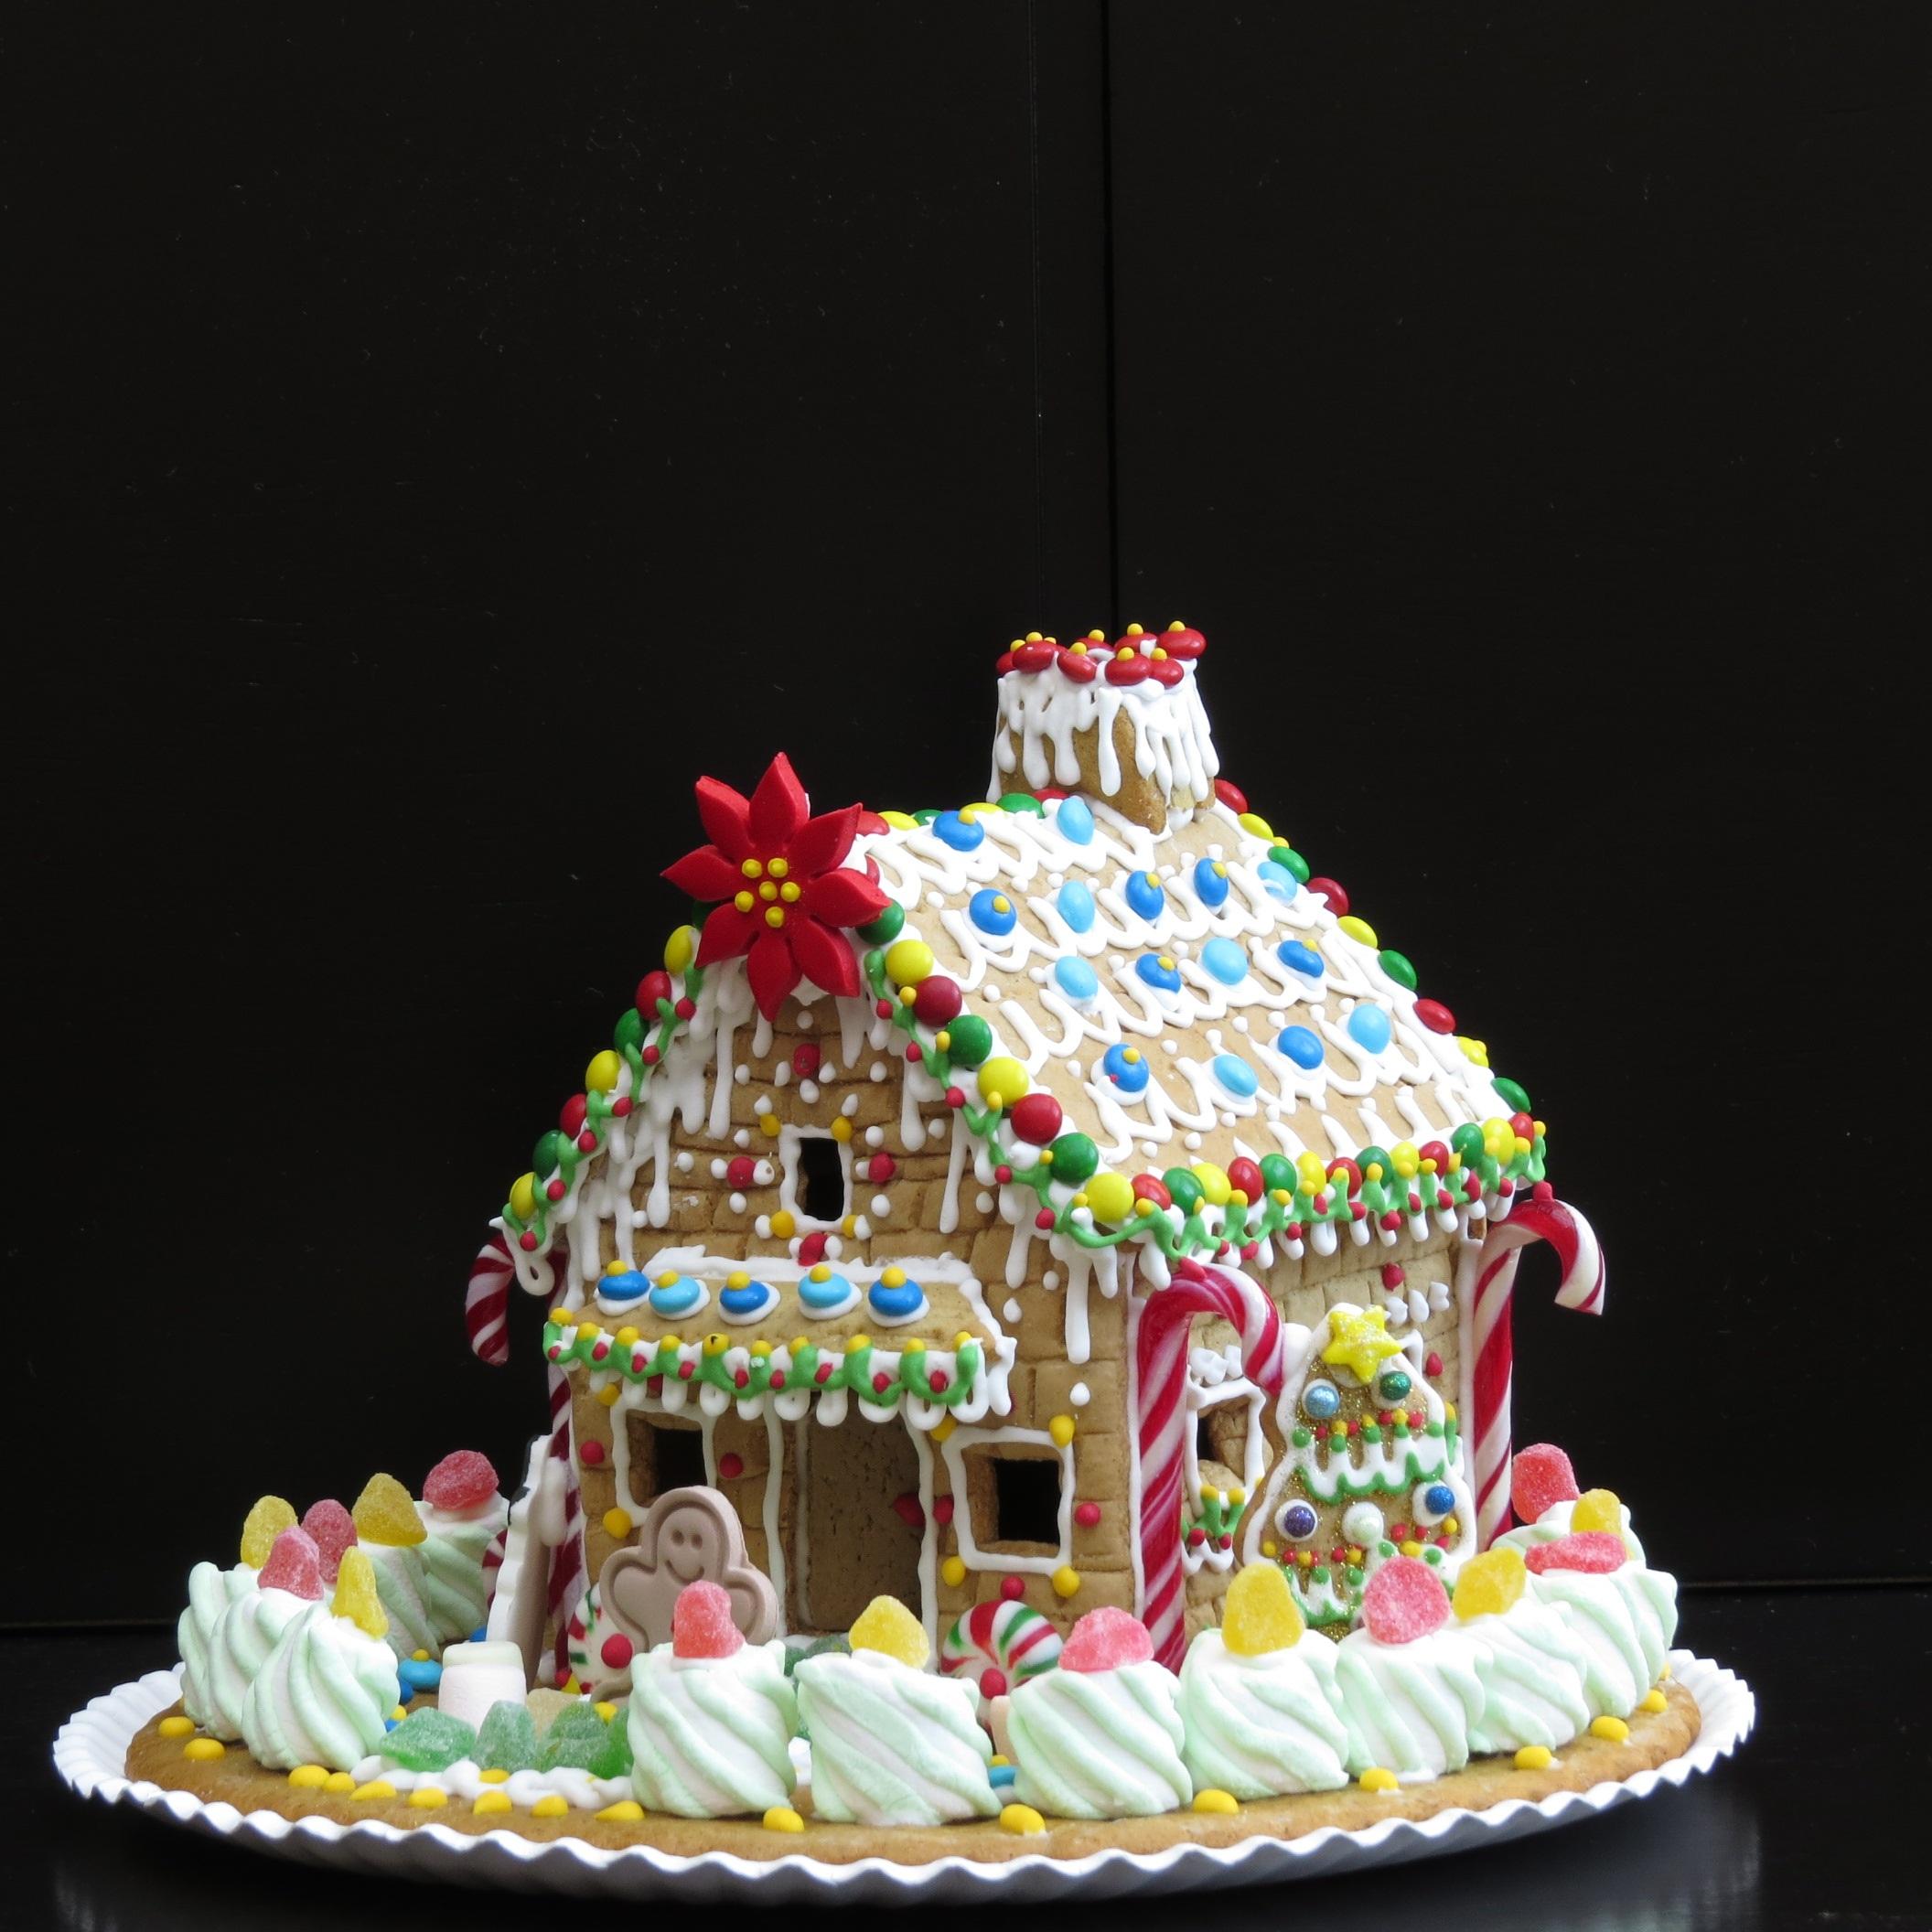 Free Images sweet celebration food dessert birthday cake